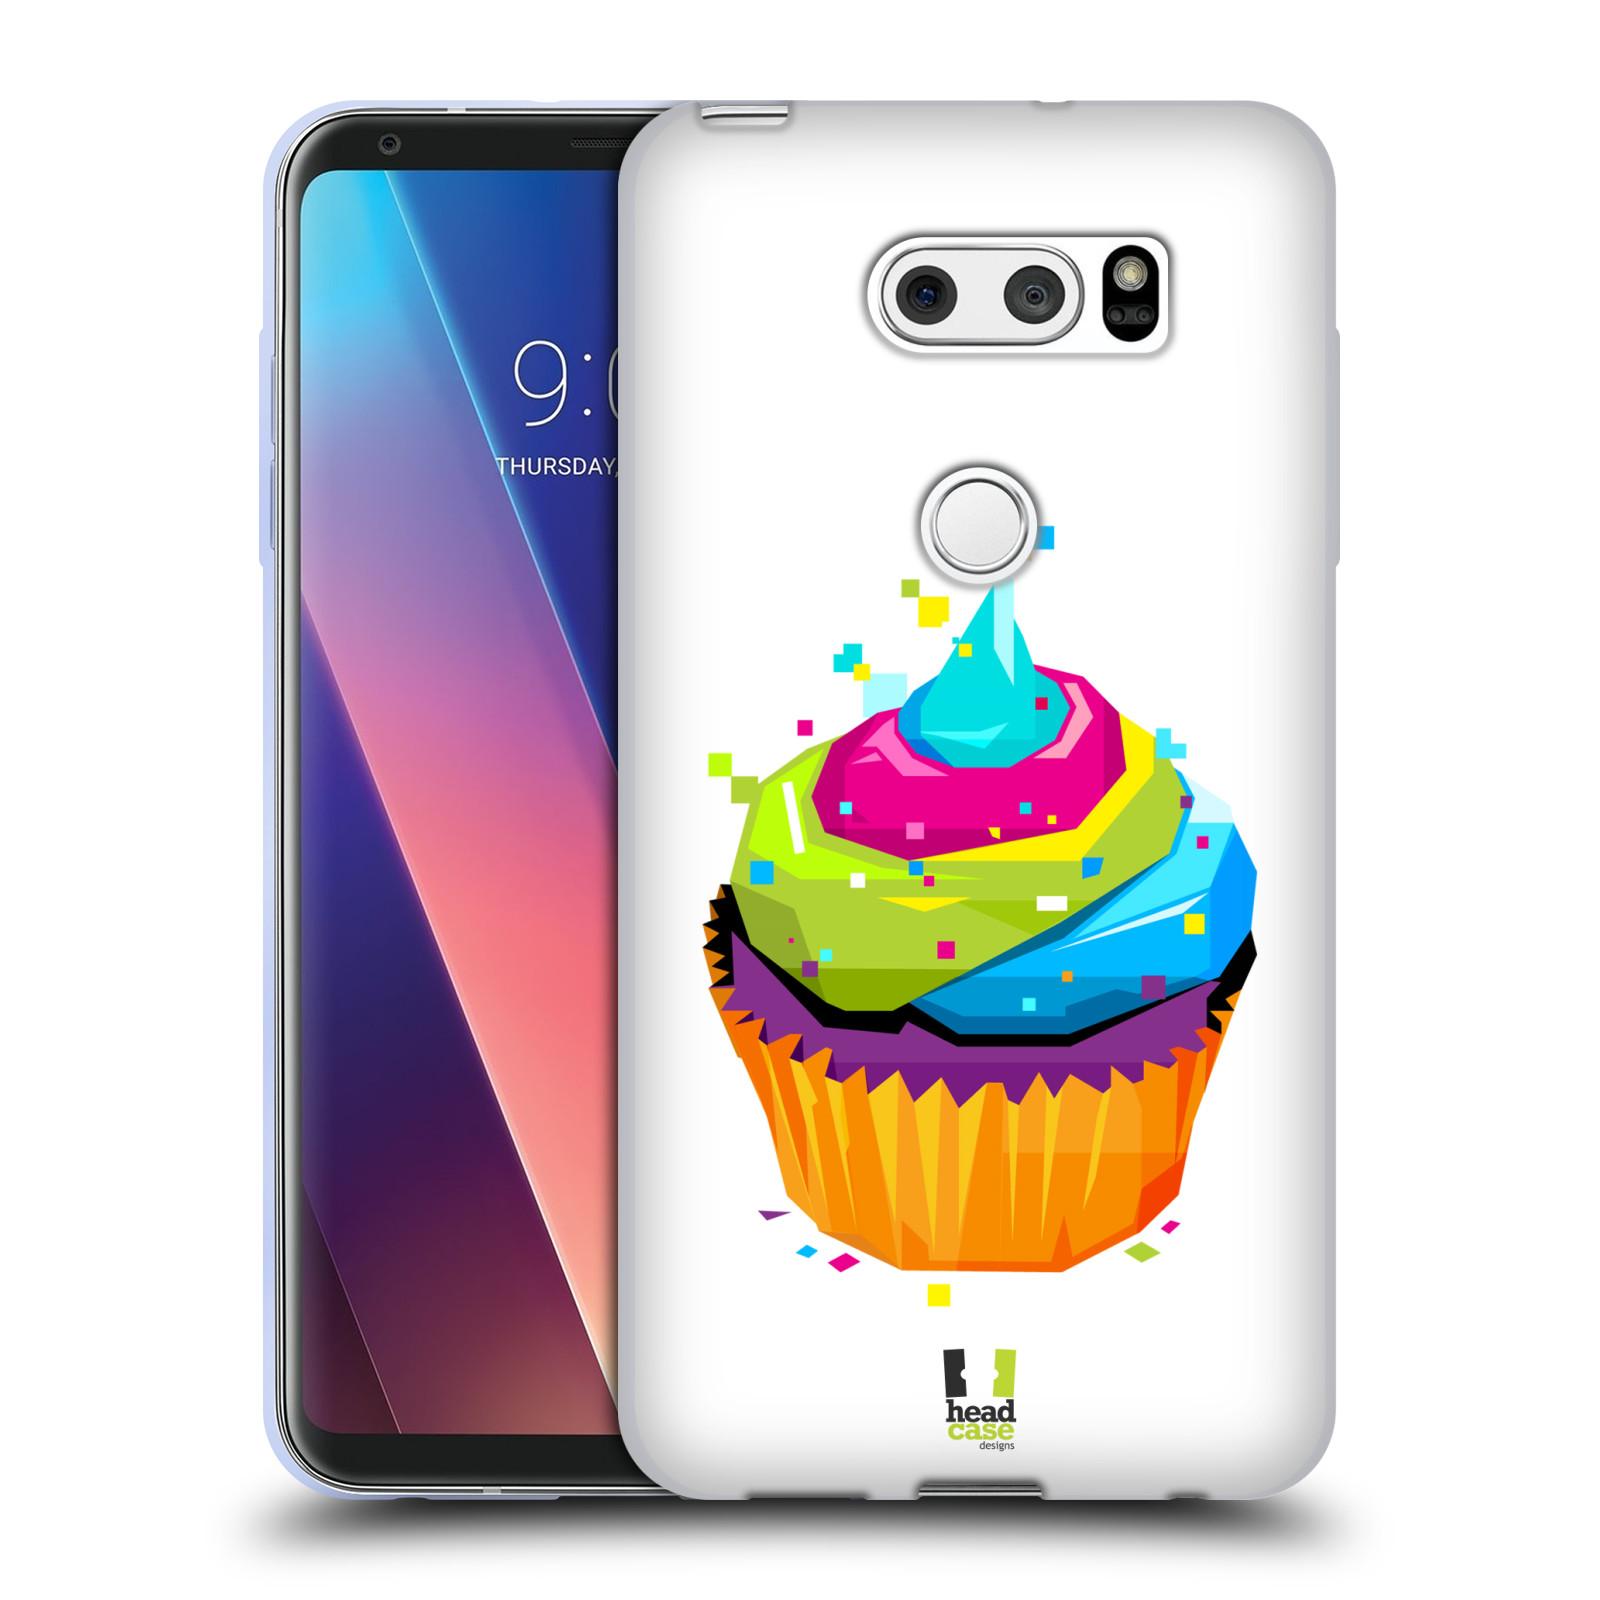 HEAD CASE silikonový obal na mobil LG V30 / V30 PLUS vzor POP ART kubismus dortík